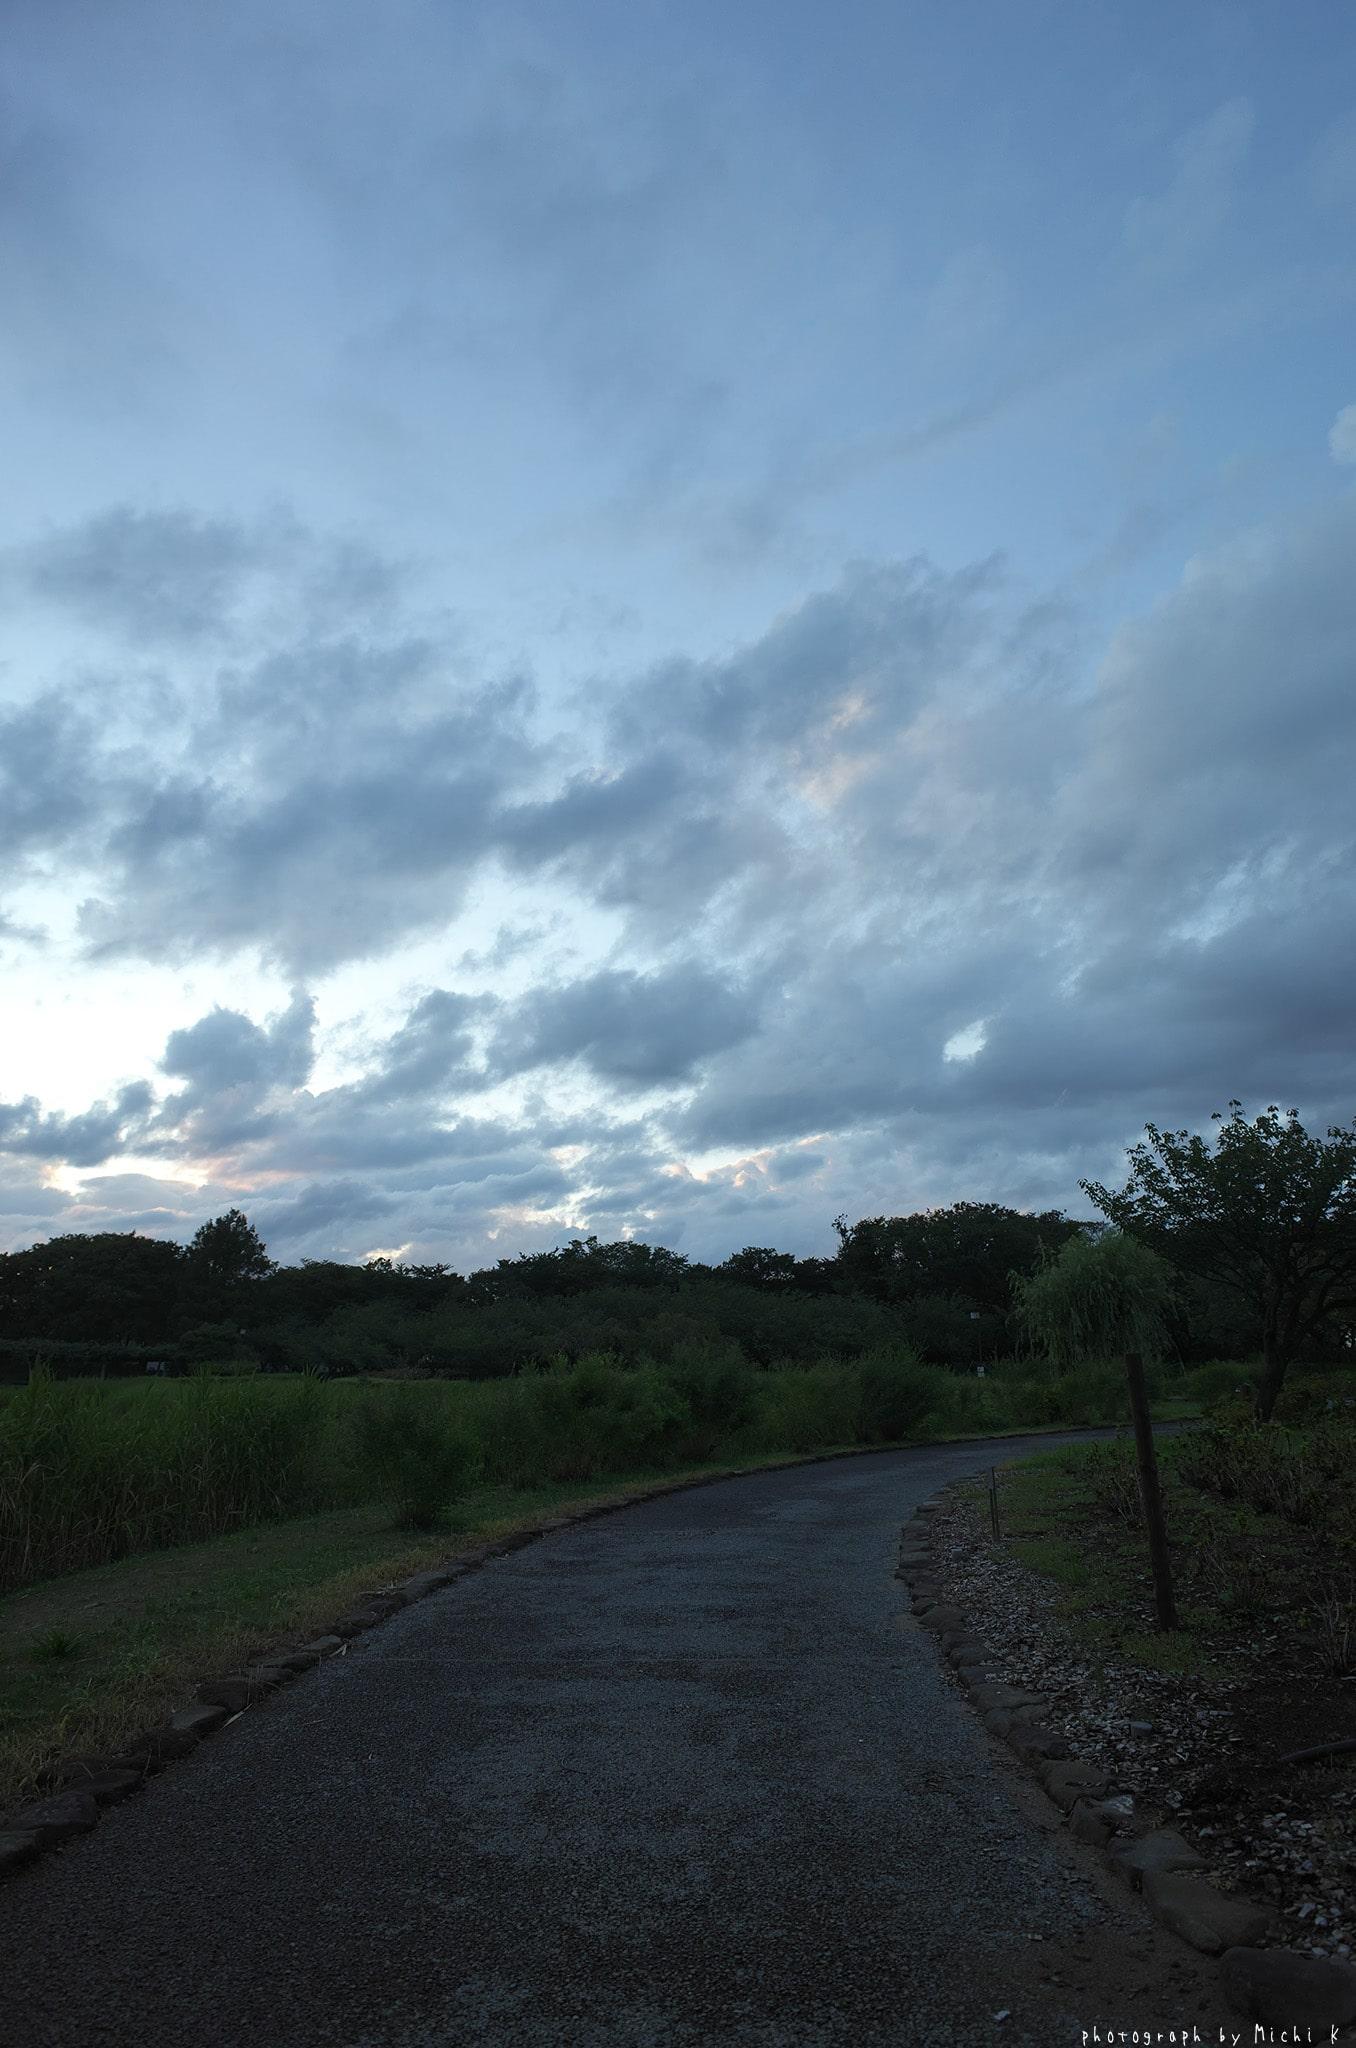 土門拳記念館2019-8-25夕方(写真その3)